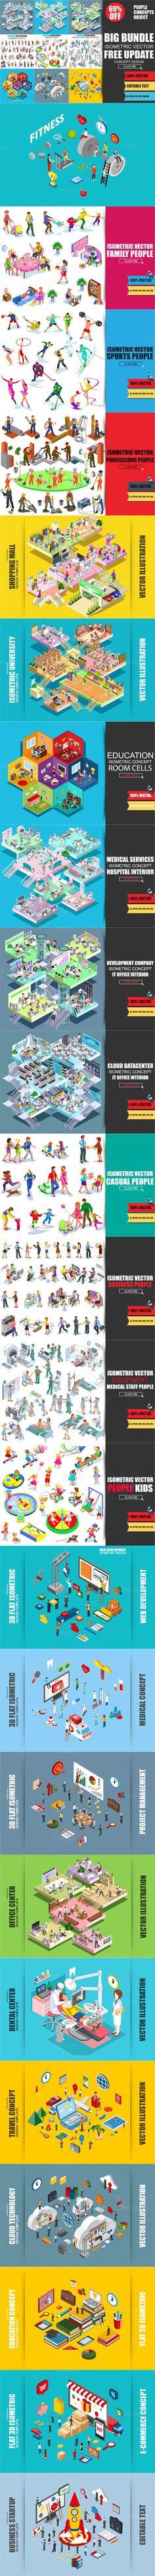 69% OFF Isometric Mega Bundle. Graphic Design Infographics. $48.00